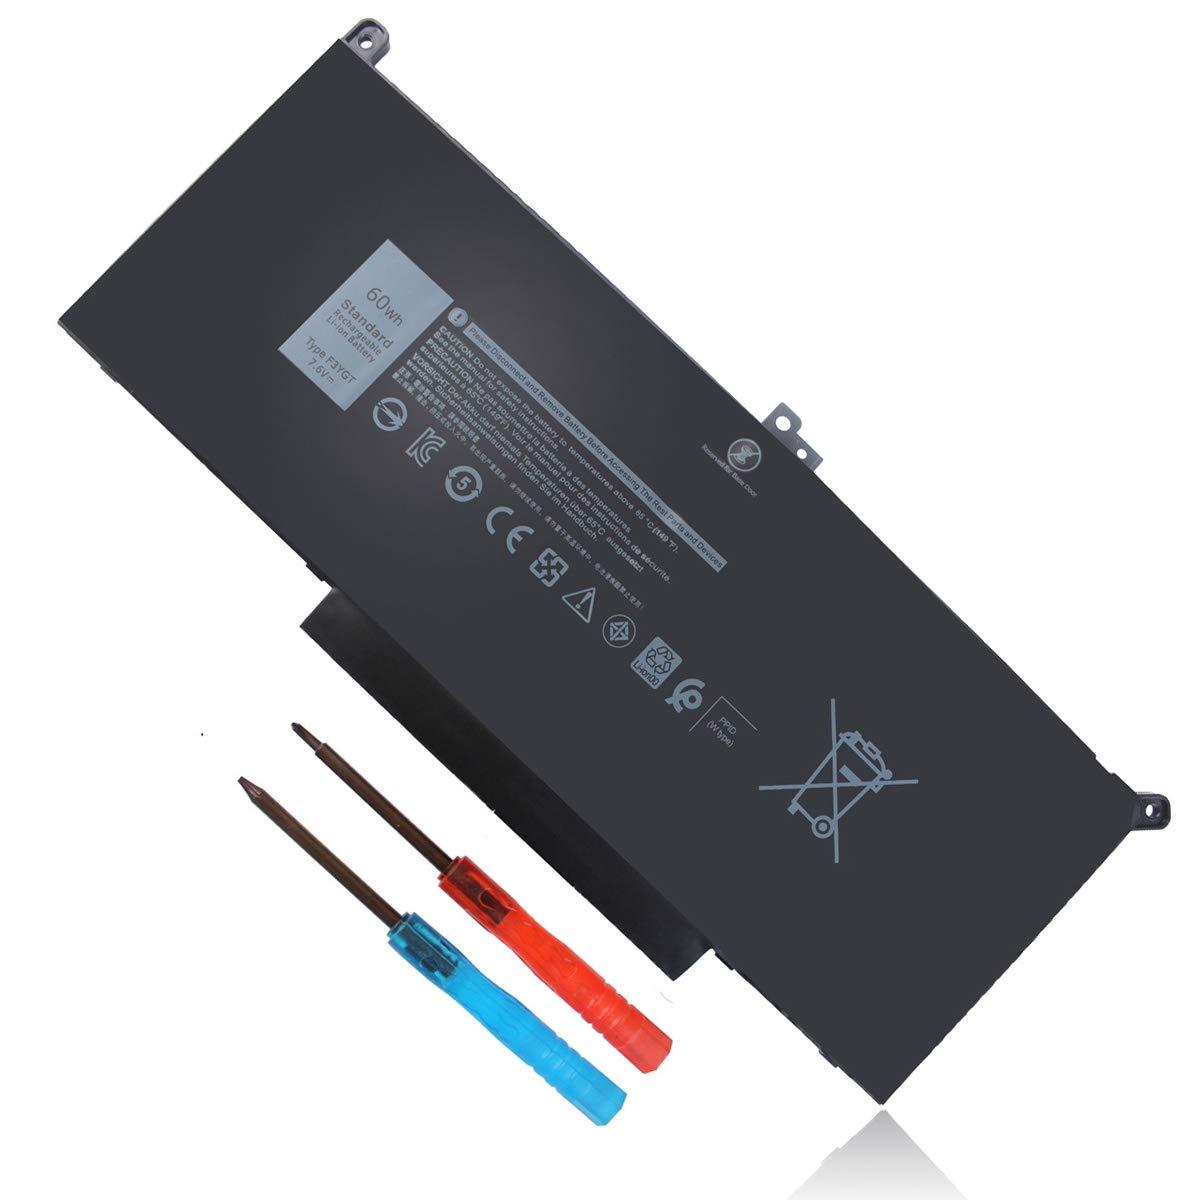 Bateria 7.6V 60Wh F3YGT Dell Latitude 7480 7380 7280 7390 74